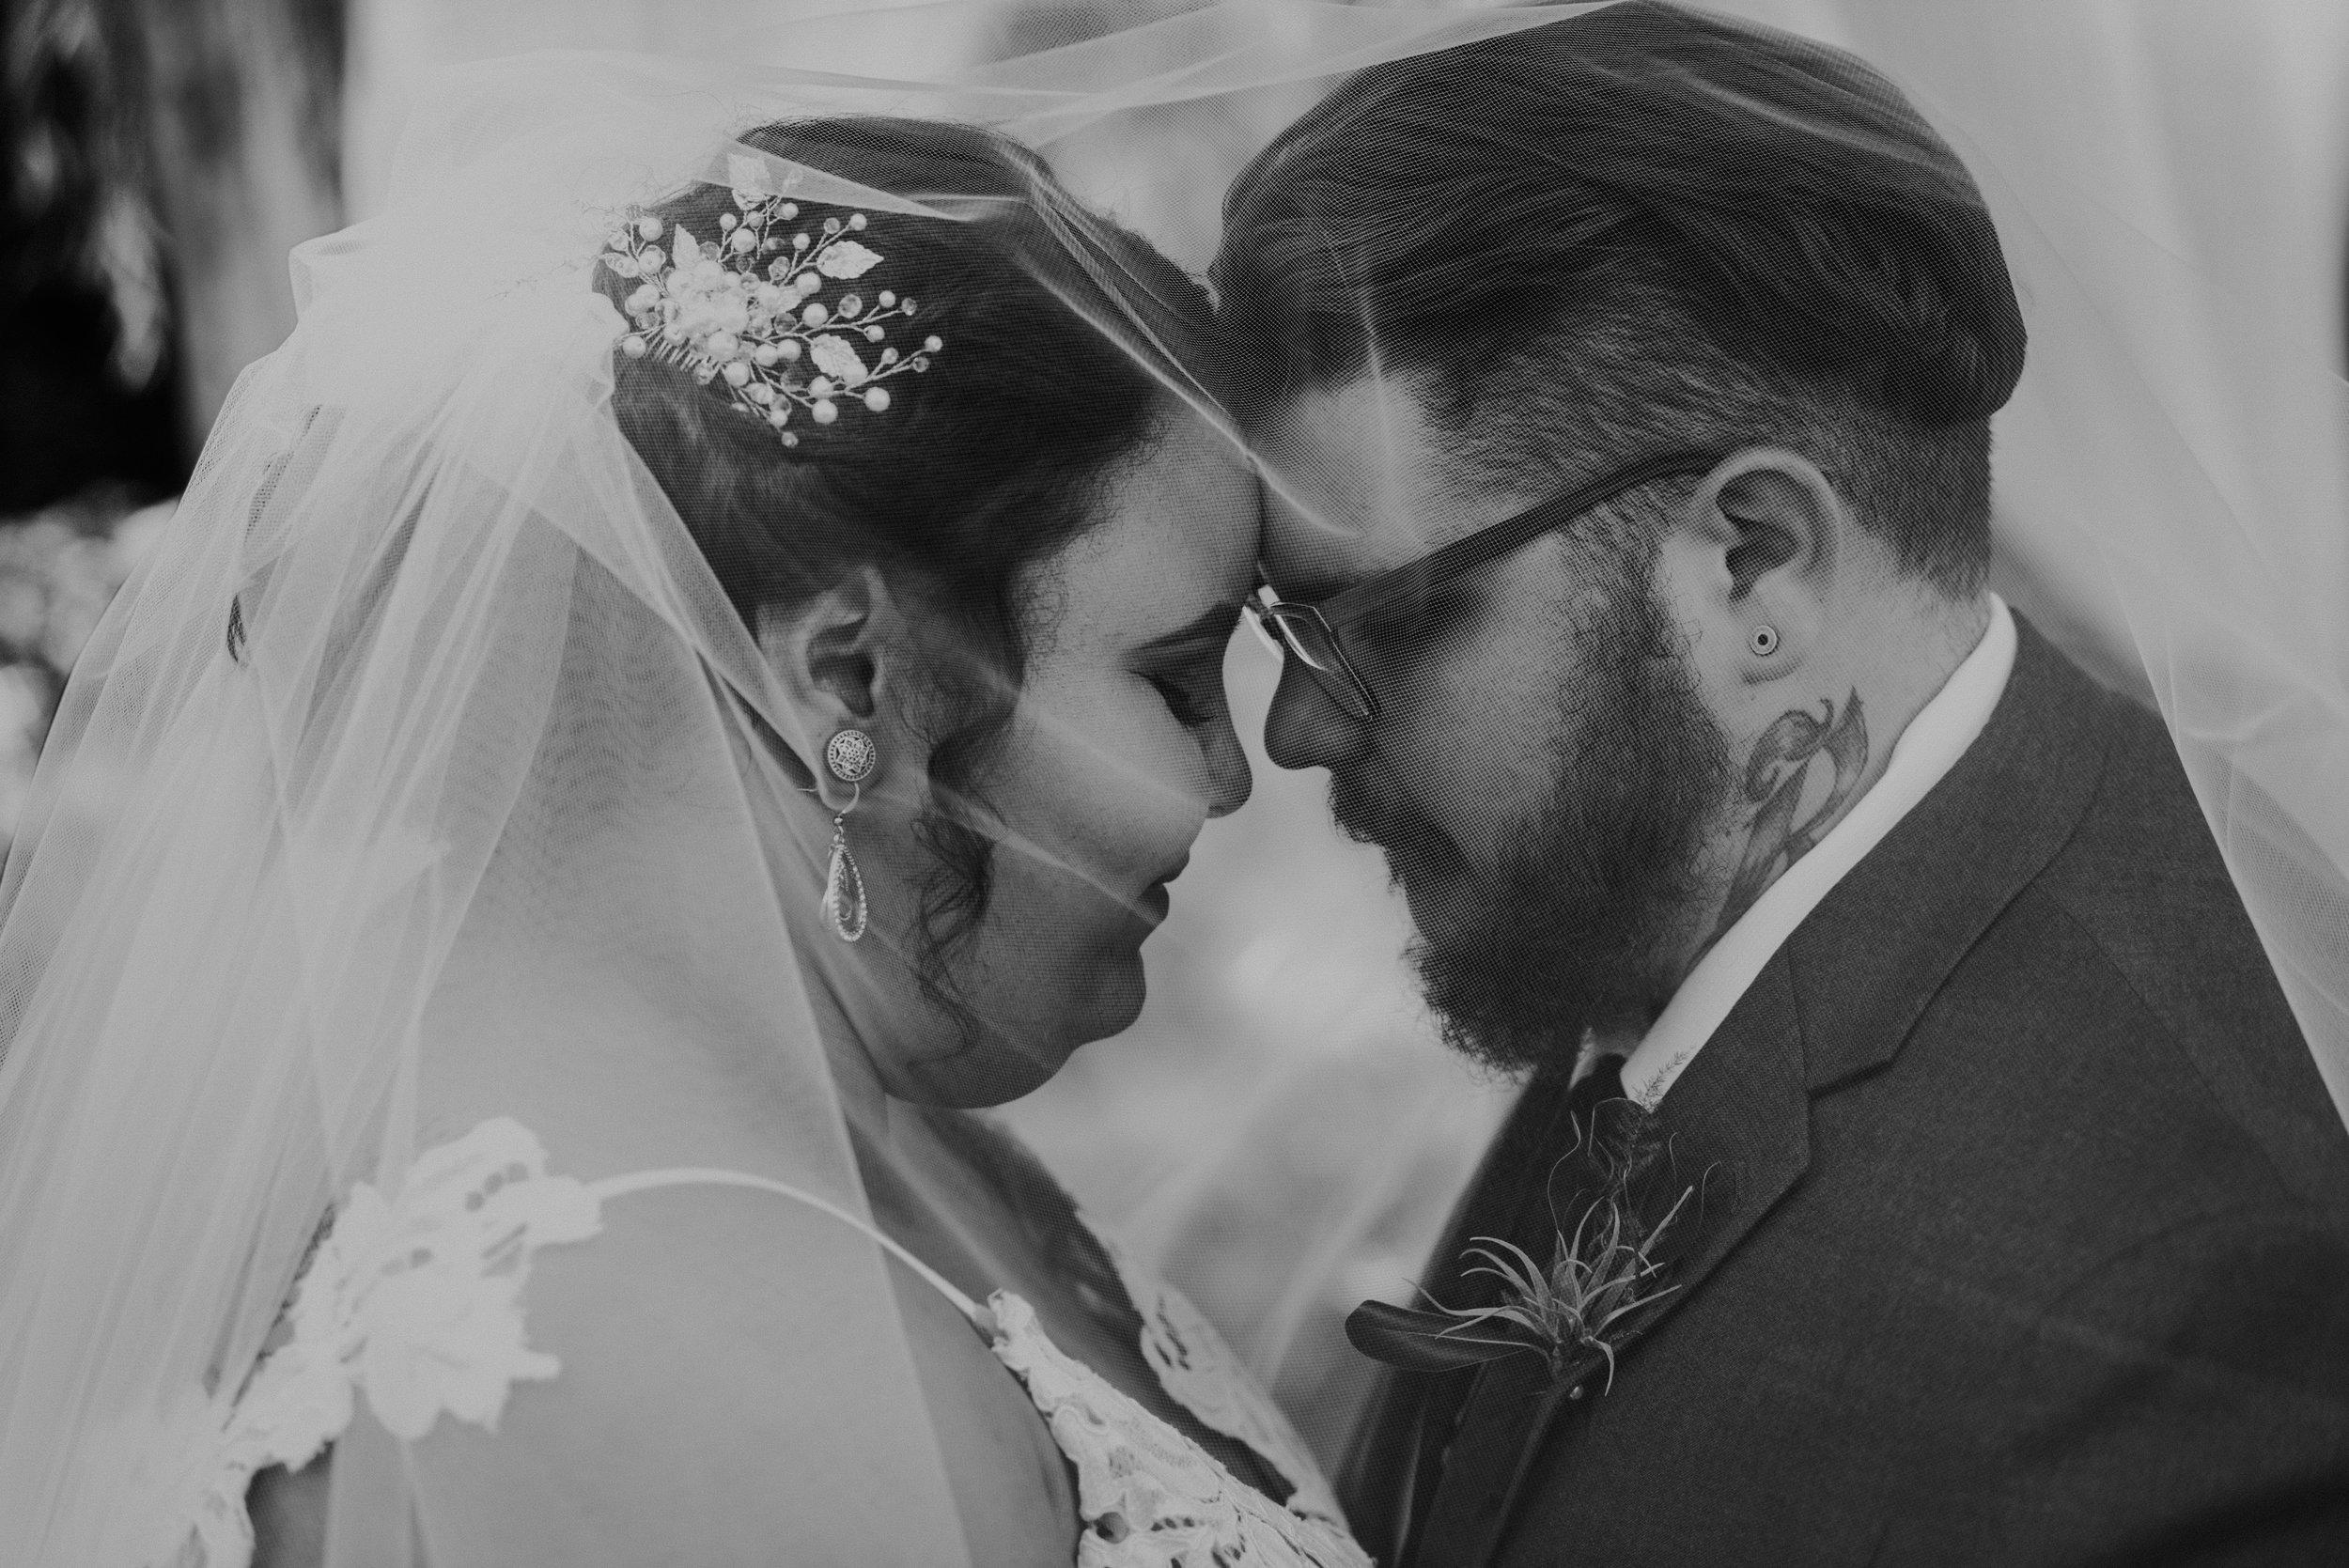 BridesbyYoung-RealWedding-PlusSizeBridal-BillyCourtney-JurassicParkTheme-30.jpg